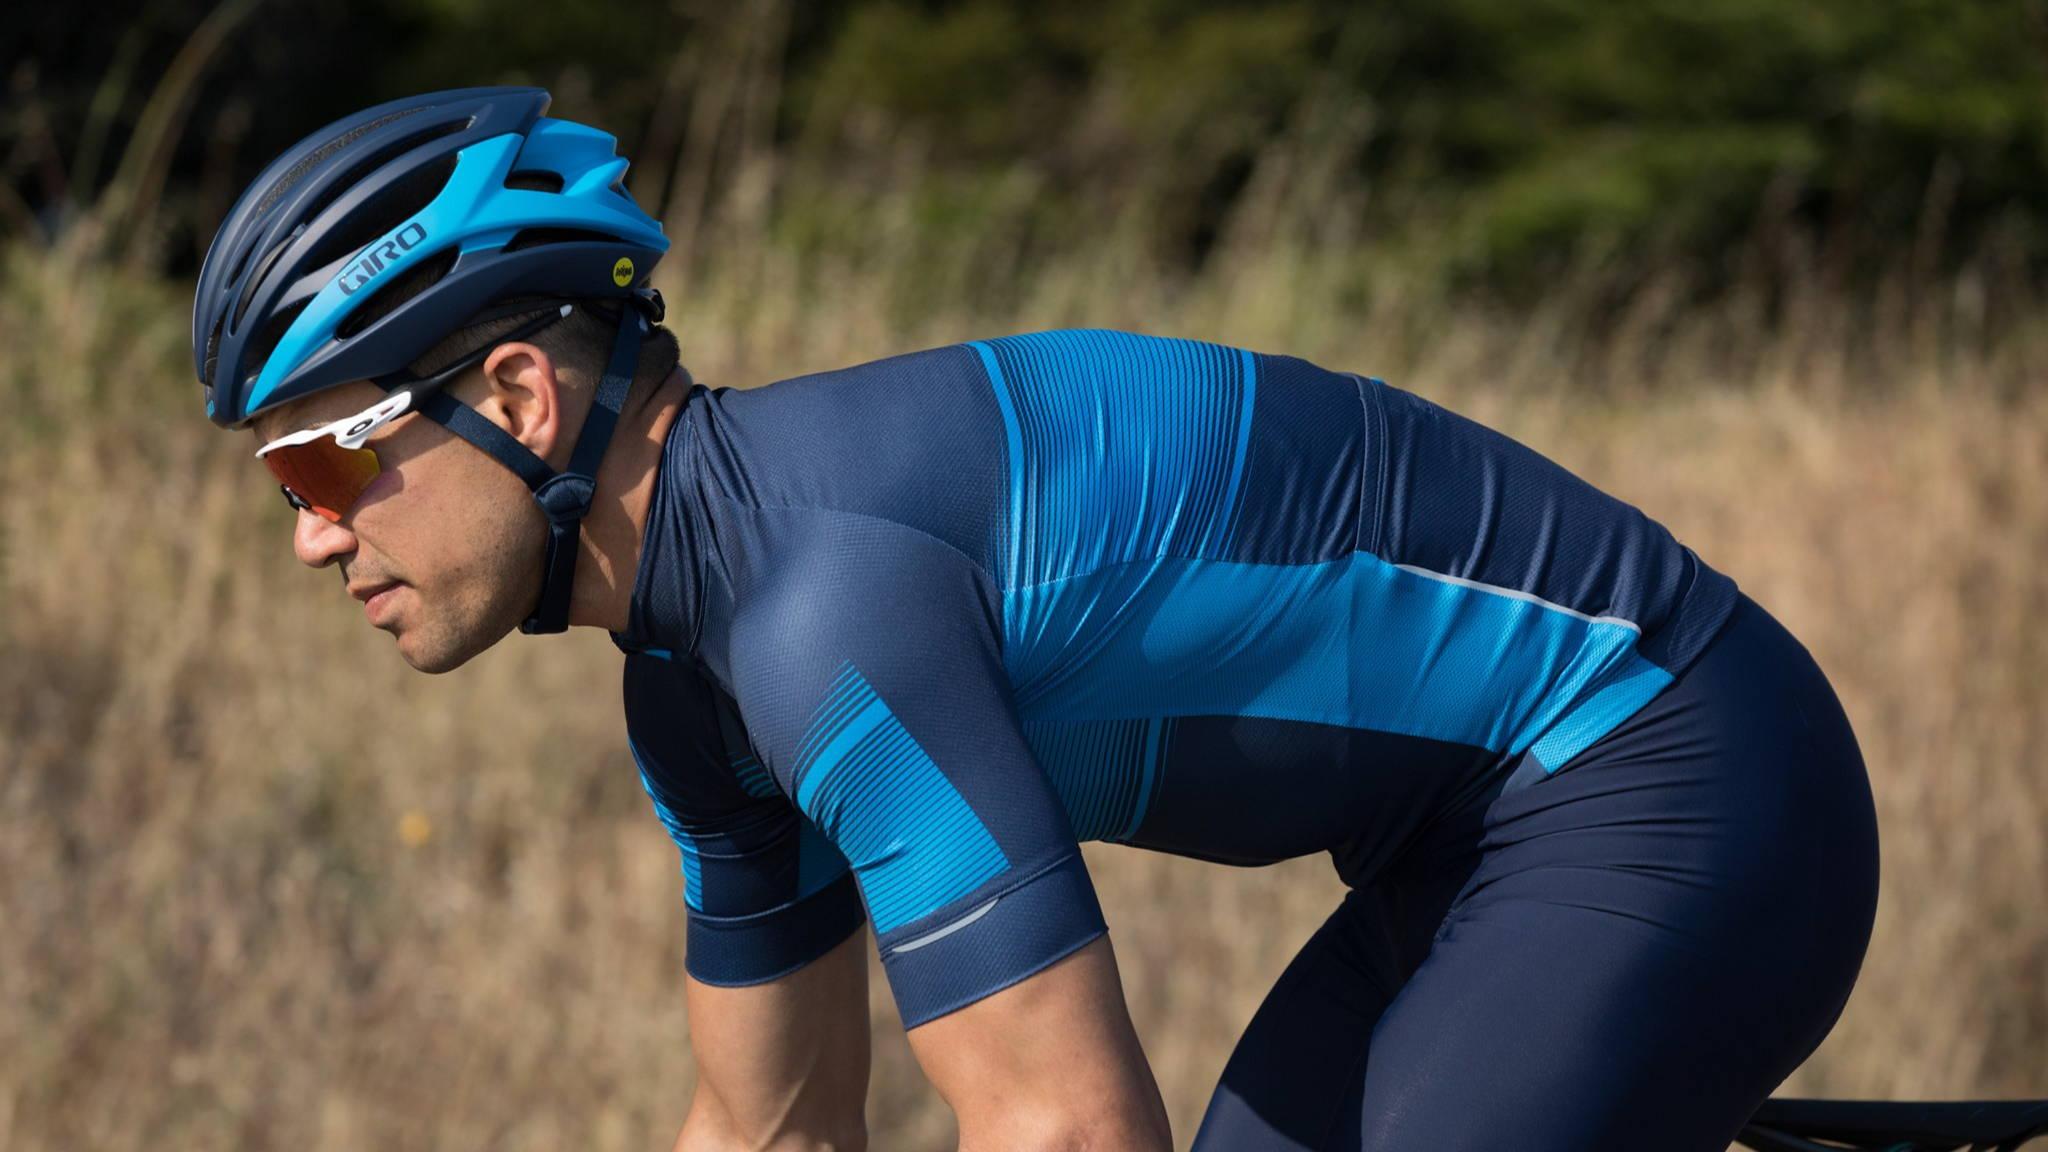 Giro Cycling Helmets - Bicicletta Vancouver